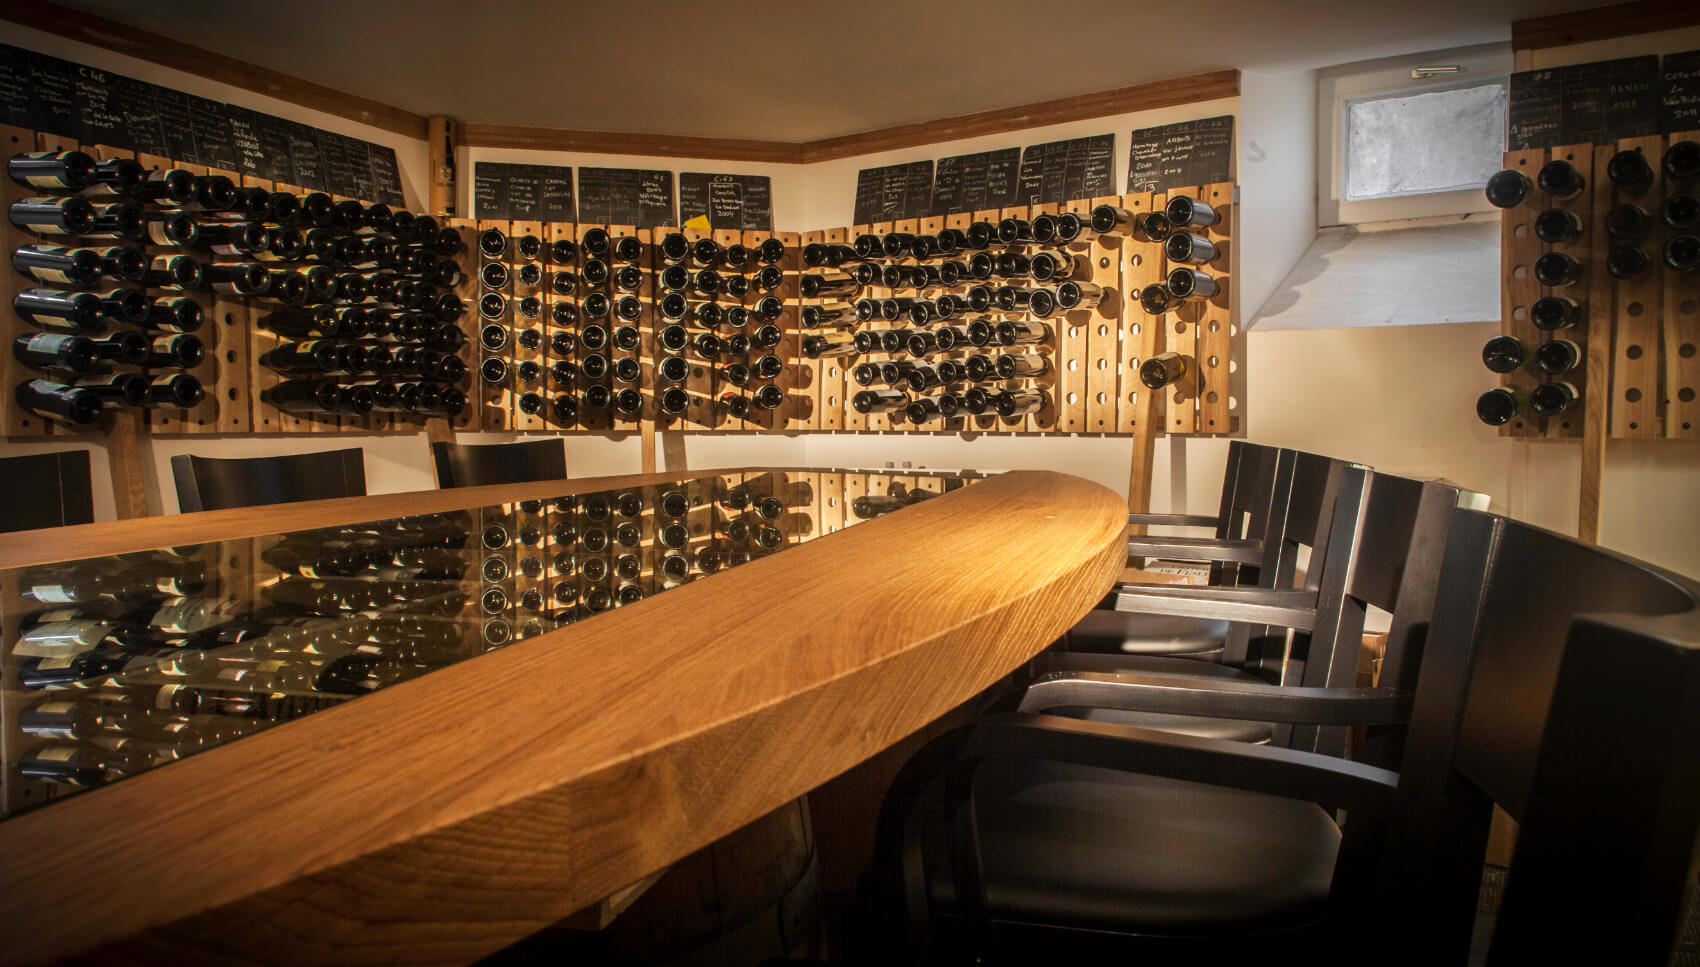 cours de cuisine d gustation de vin alsace bistrot la cave. Black Bedroom Furniture Sets. Home Design Ideas